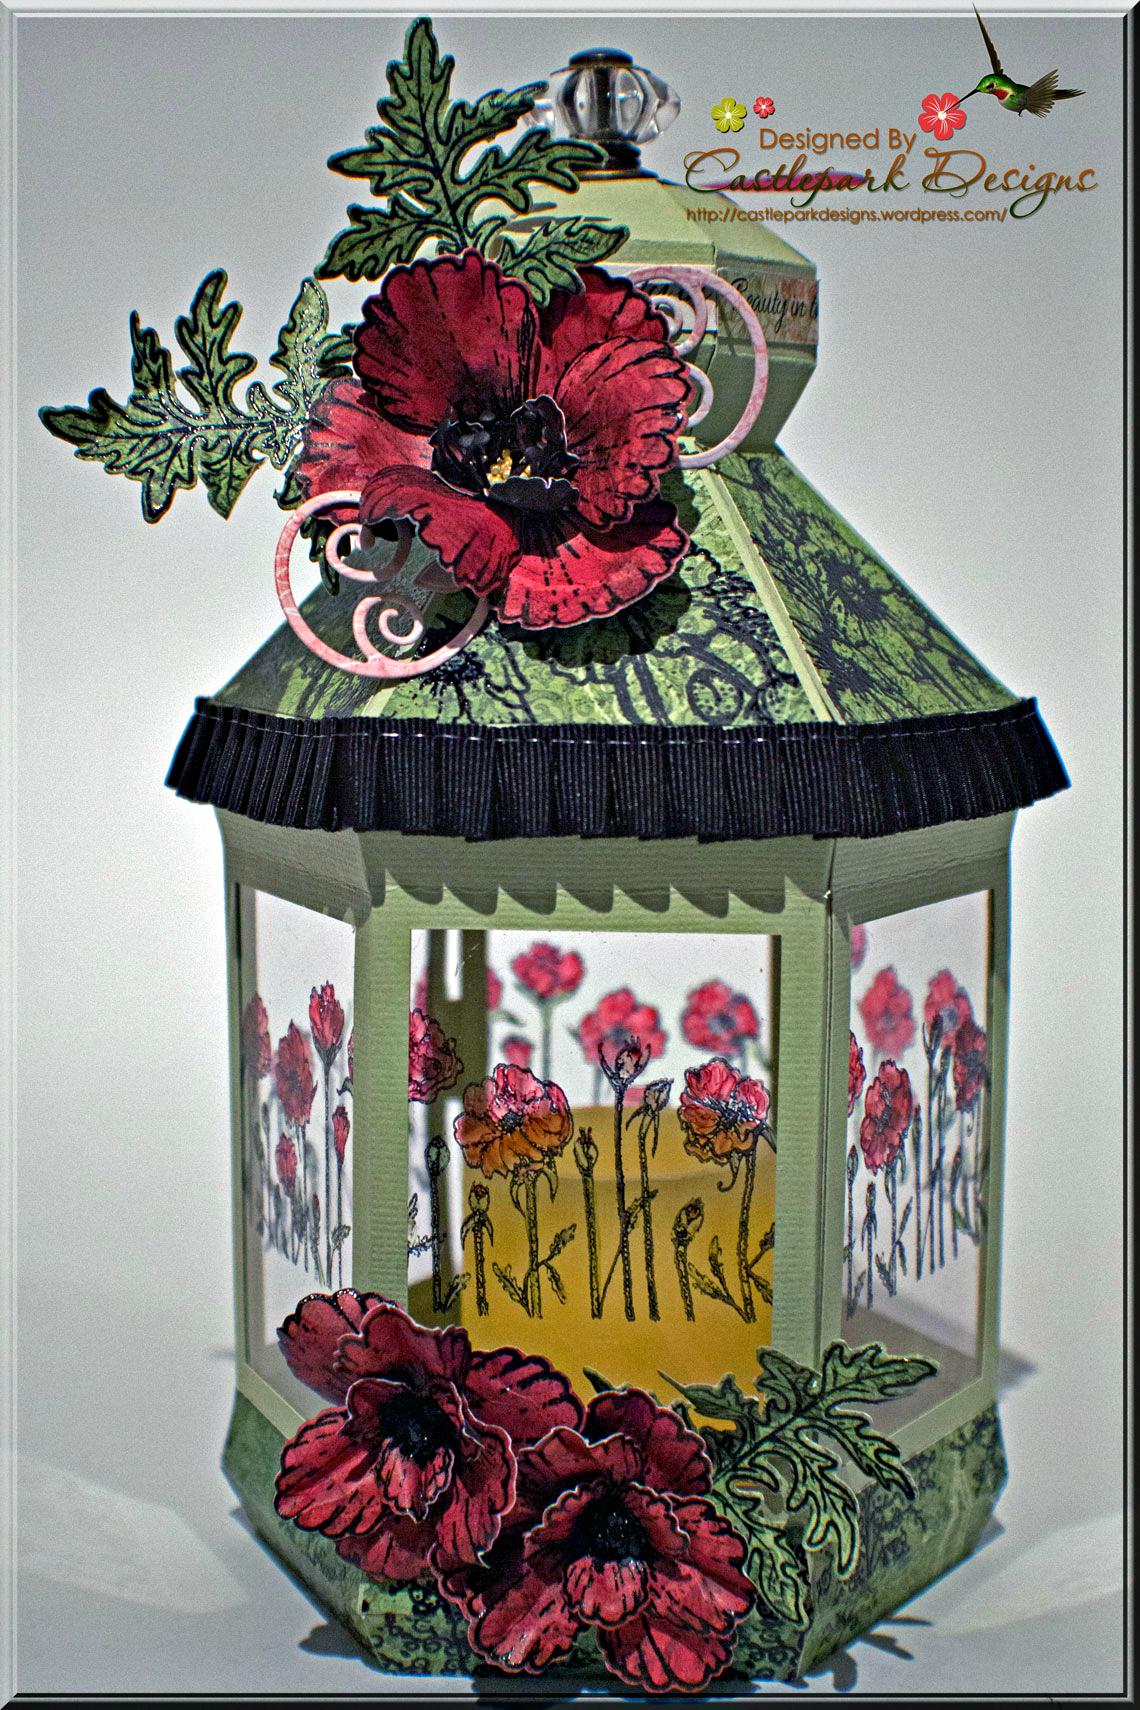 Beauty In The Simple Things Lantern Castlepark Designs